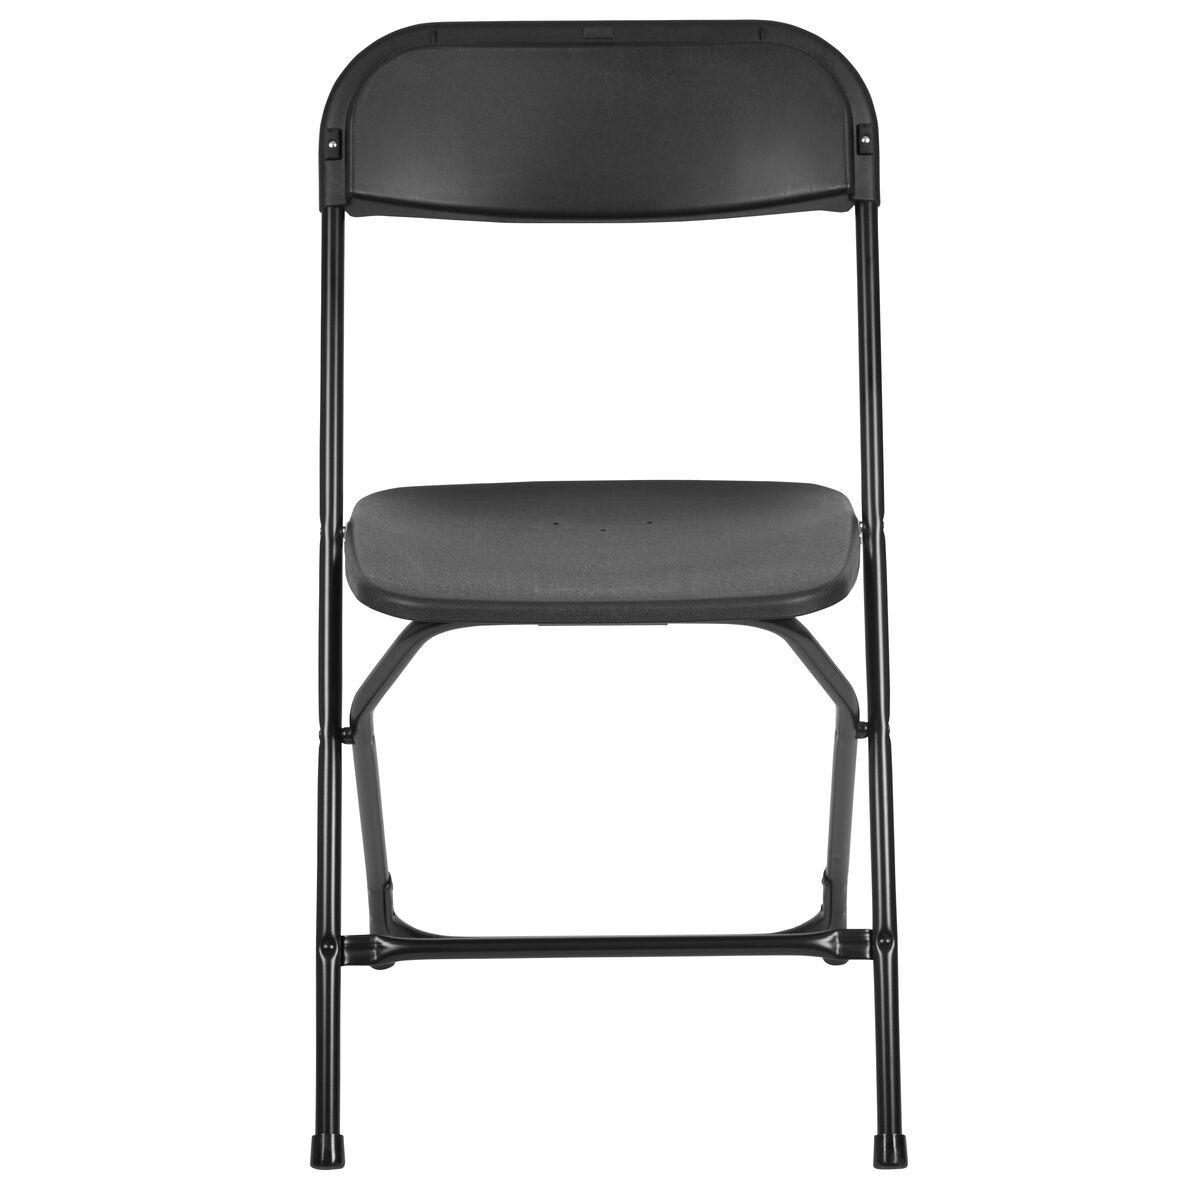 Prime Hercules Series 650 Lb Capacity Premium Black Plastic Folding Chair Caraccident5 Cool Chair Designs And Ideas Caraccident5Info